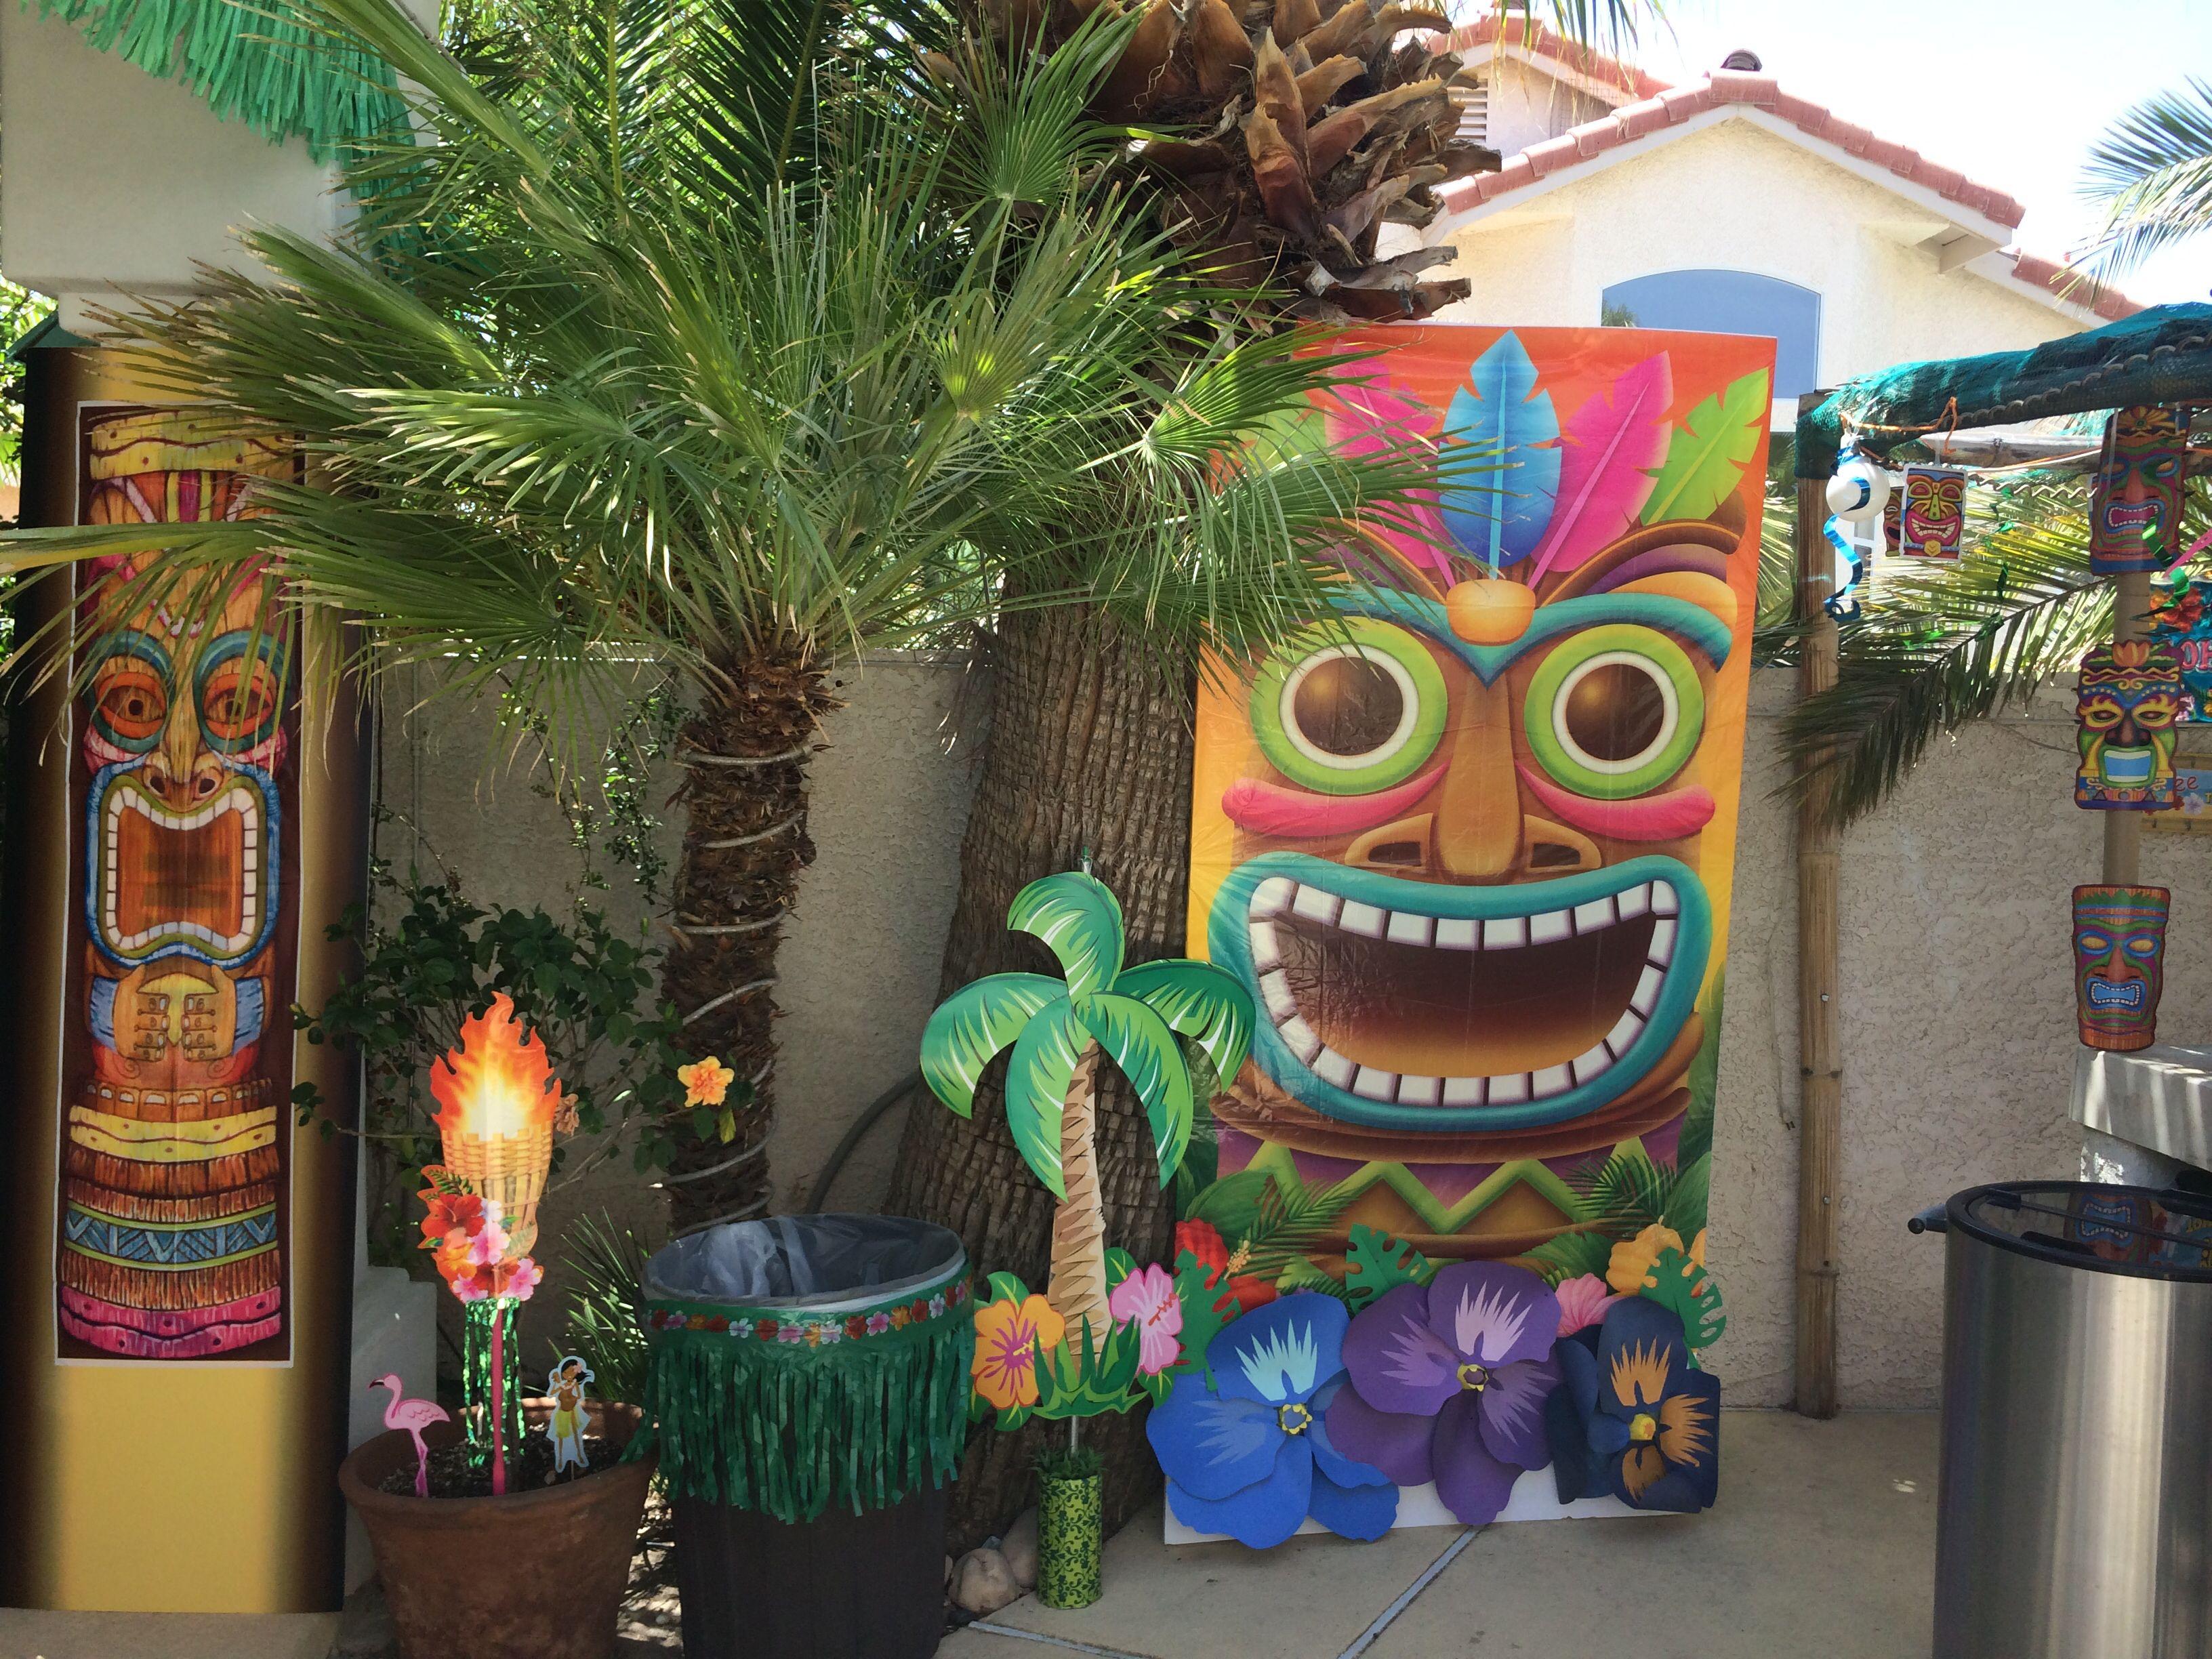 Backyard (With images) | Its my birthday, Luau party, Luau